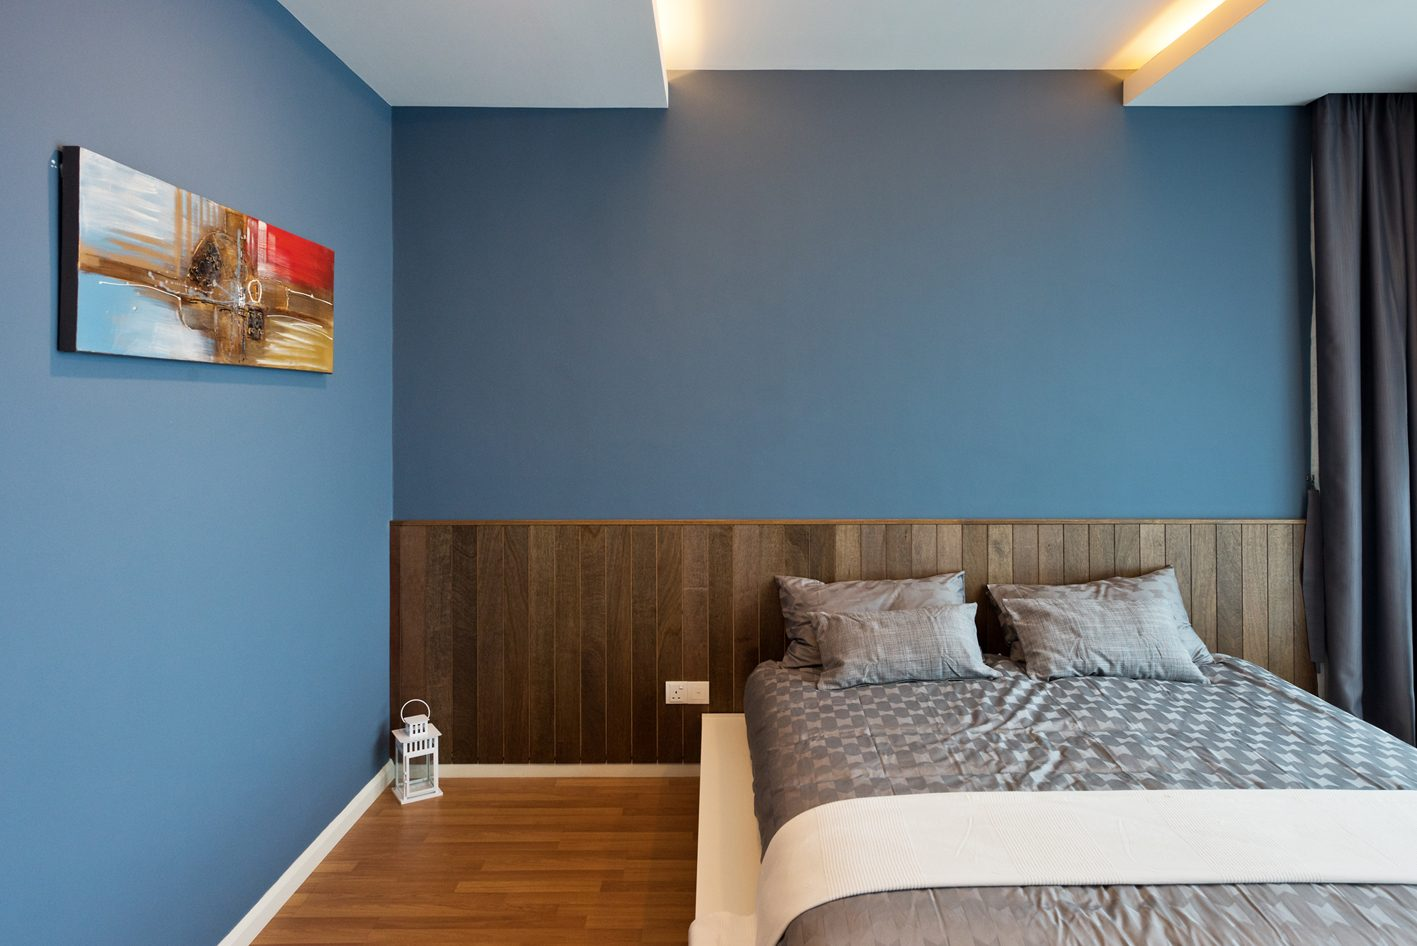 Aegean blue walls and waist-height wood panels for this condominium in Bandar Sunway, Subang Jaya